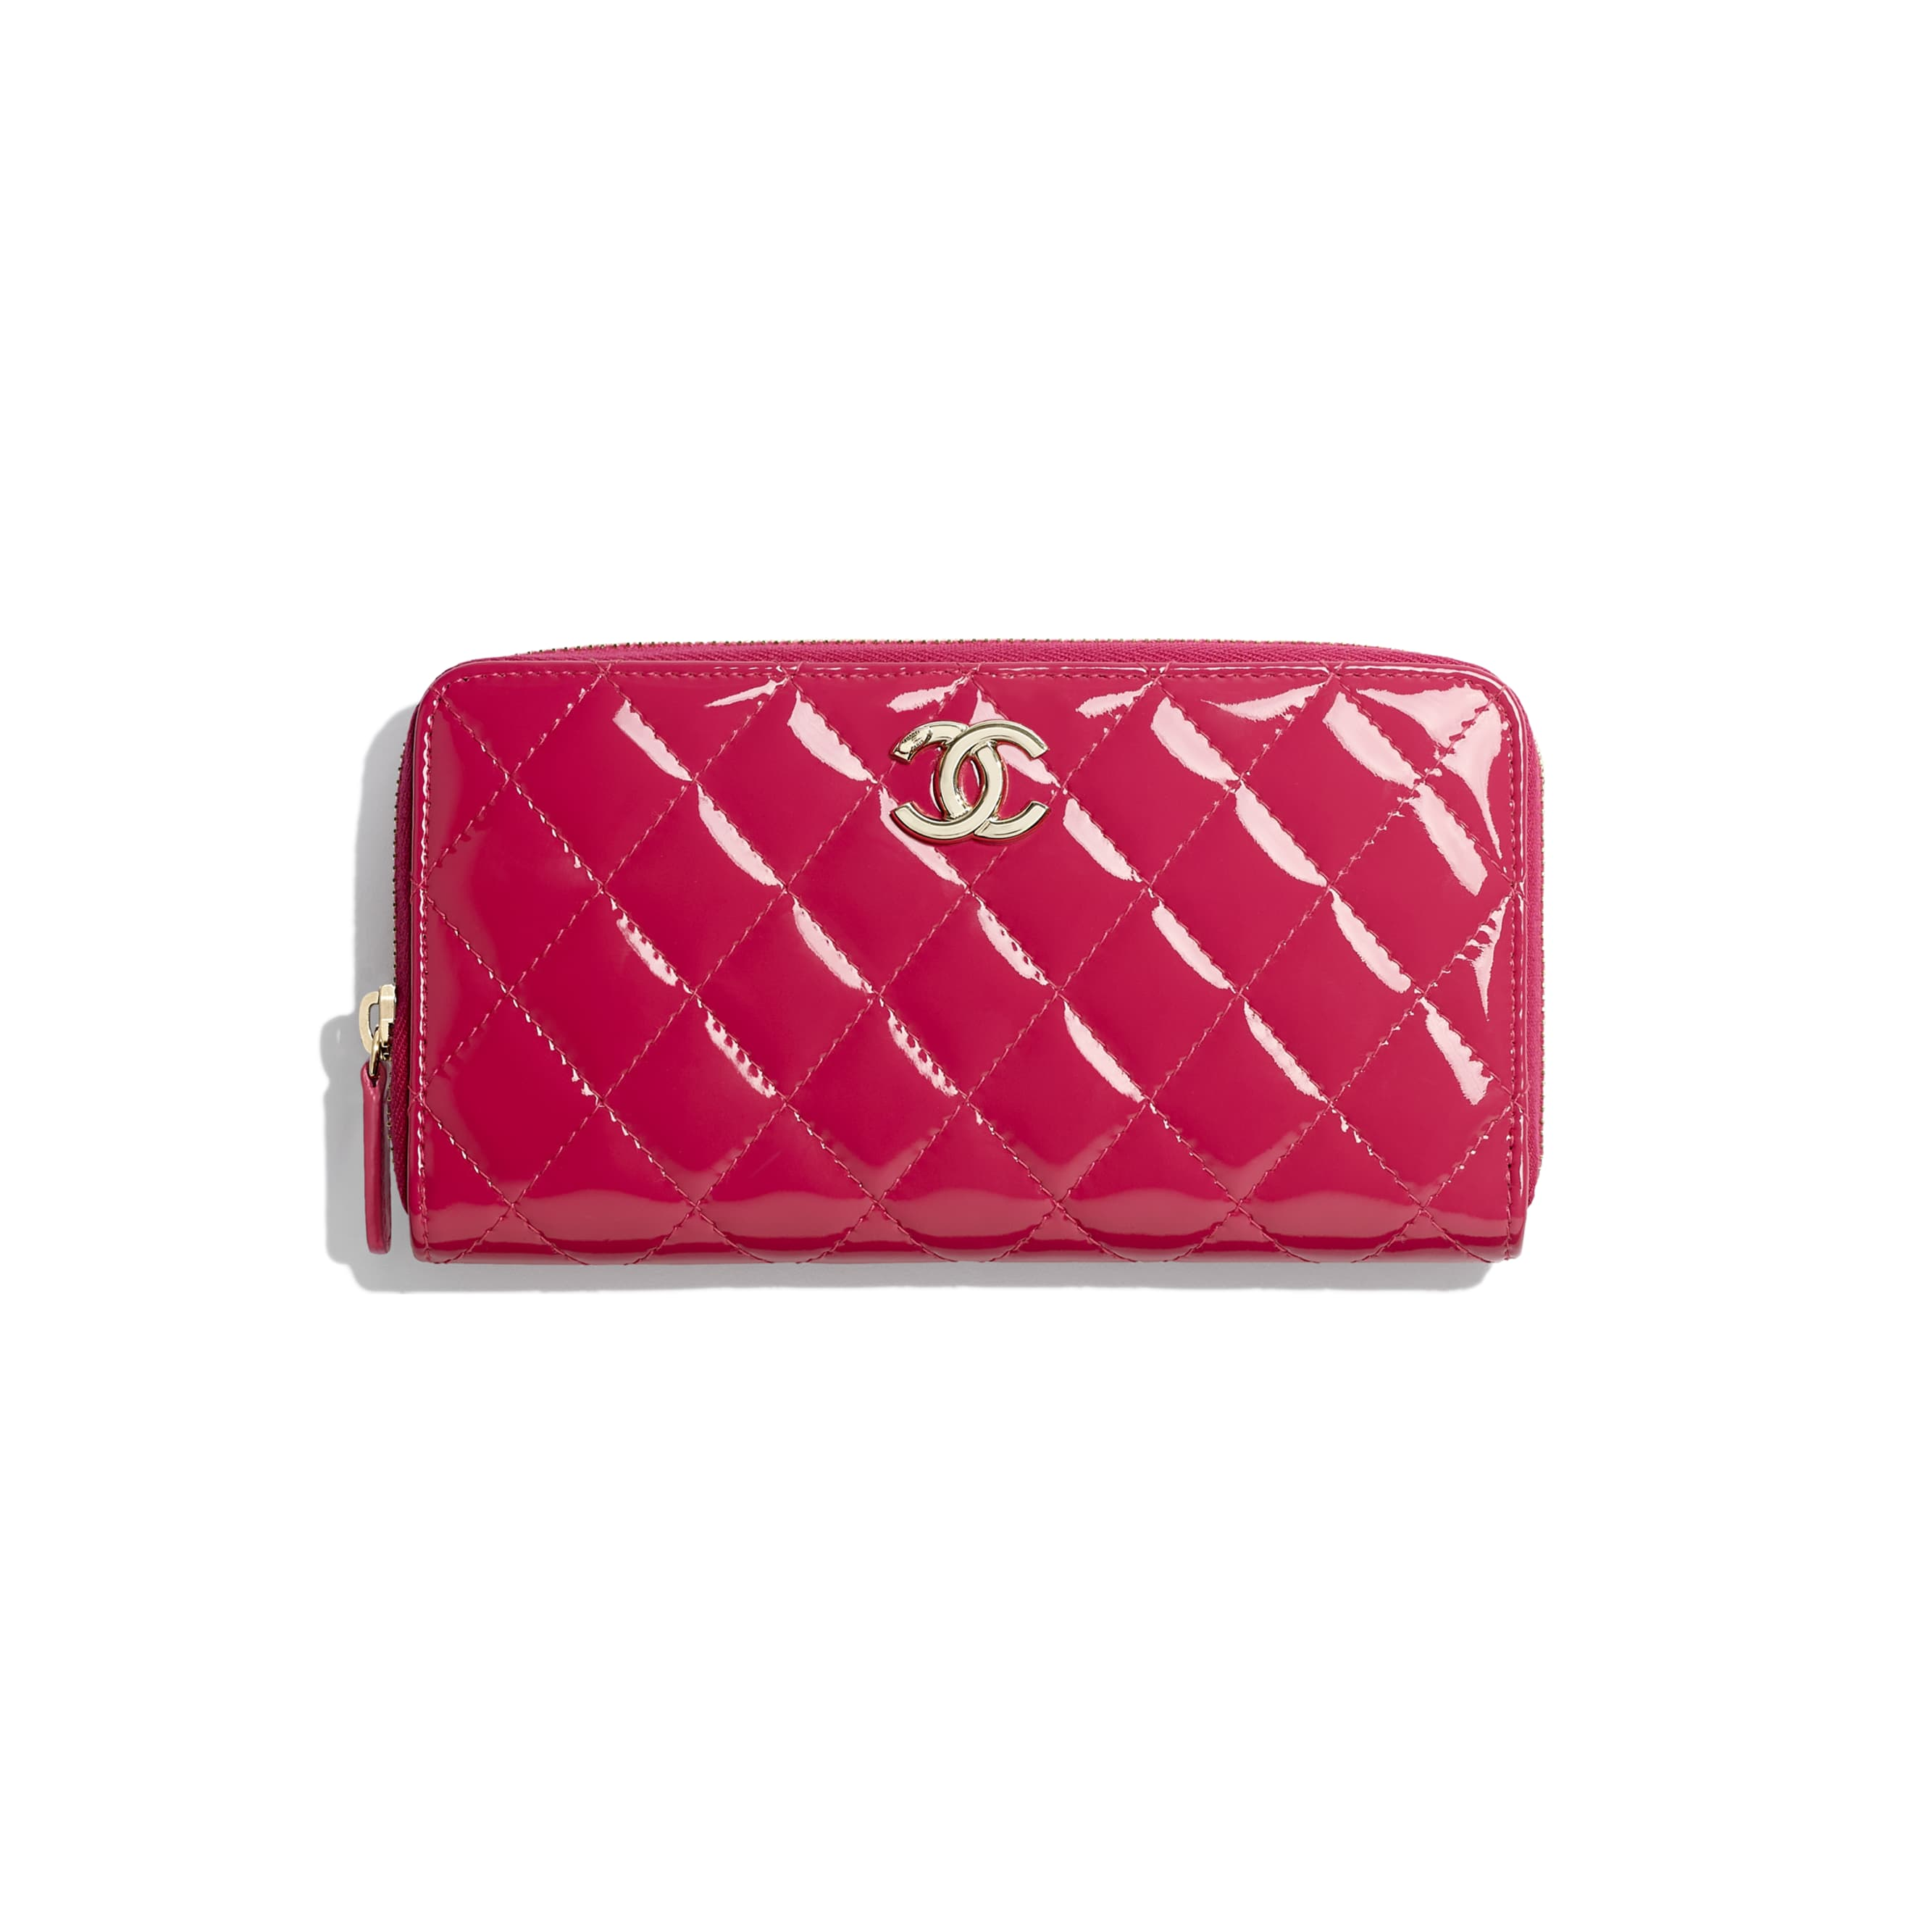 Long Zipped Wallet - Pink - Patent Calfskin, Lambskin & Gold-Tone Metal - CHANEL - Default view - see standard sized version